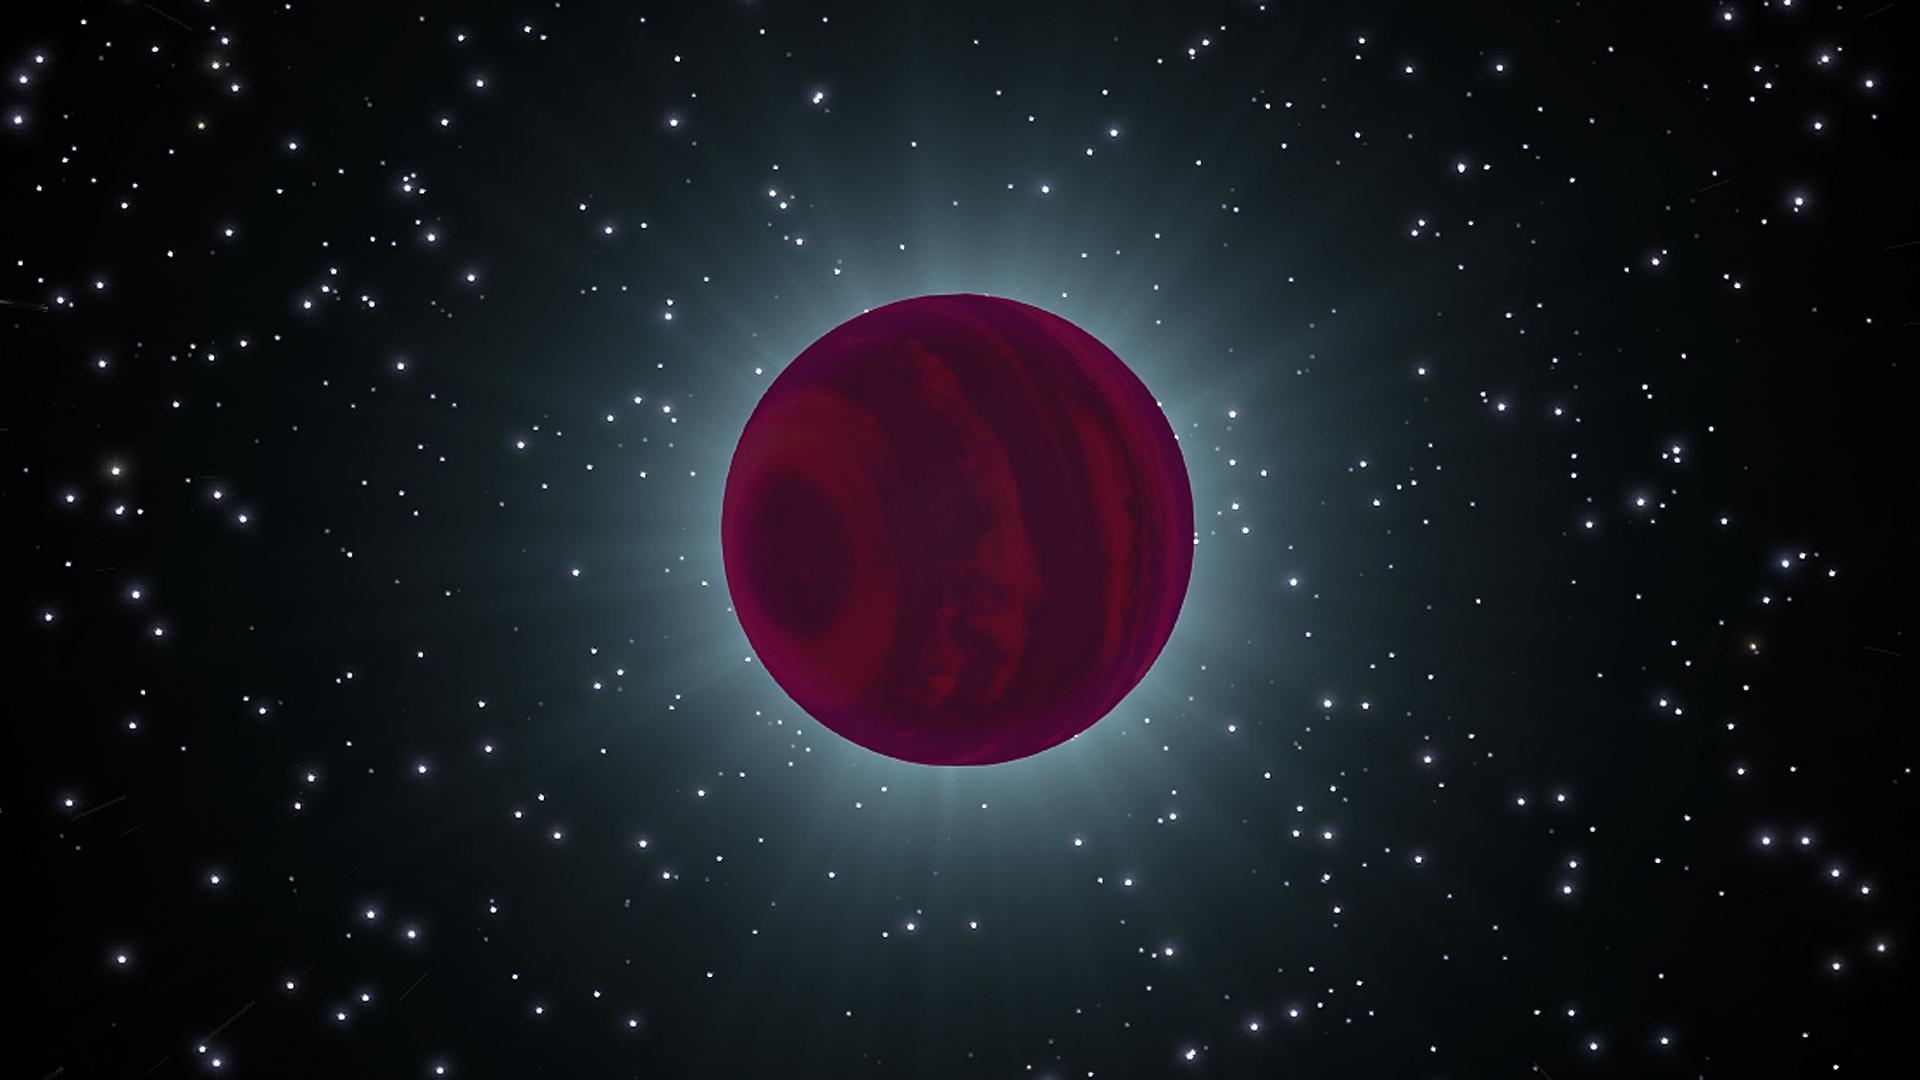 pn02-016-eclipse.jpg